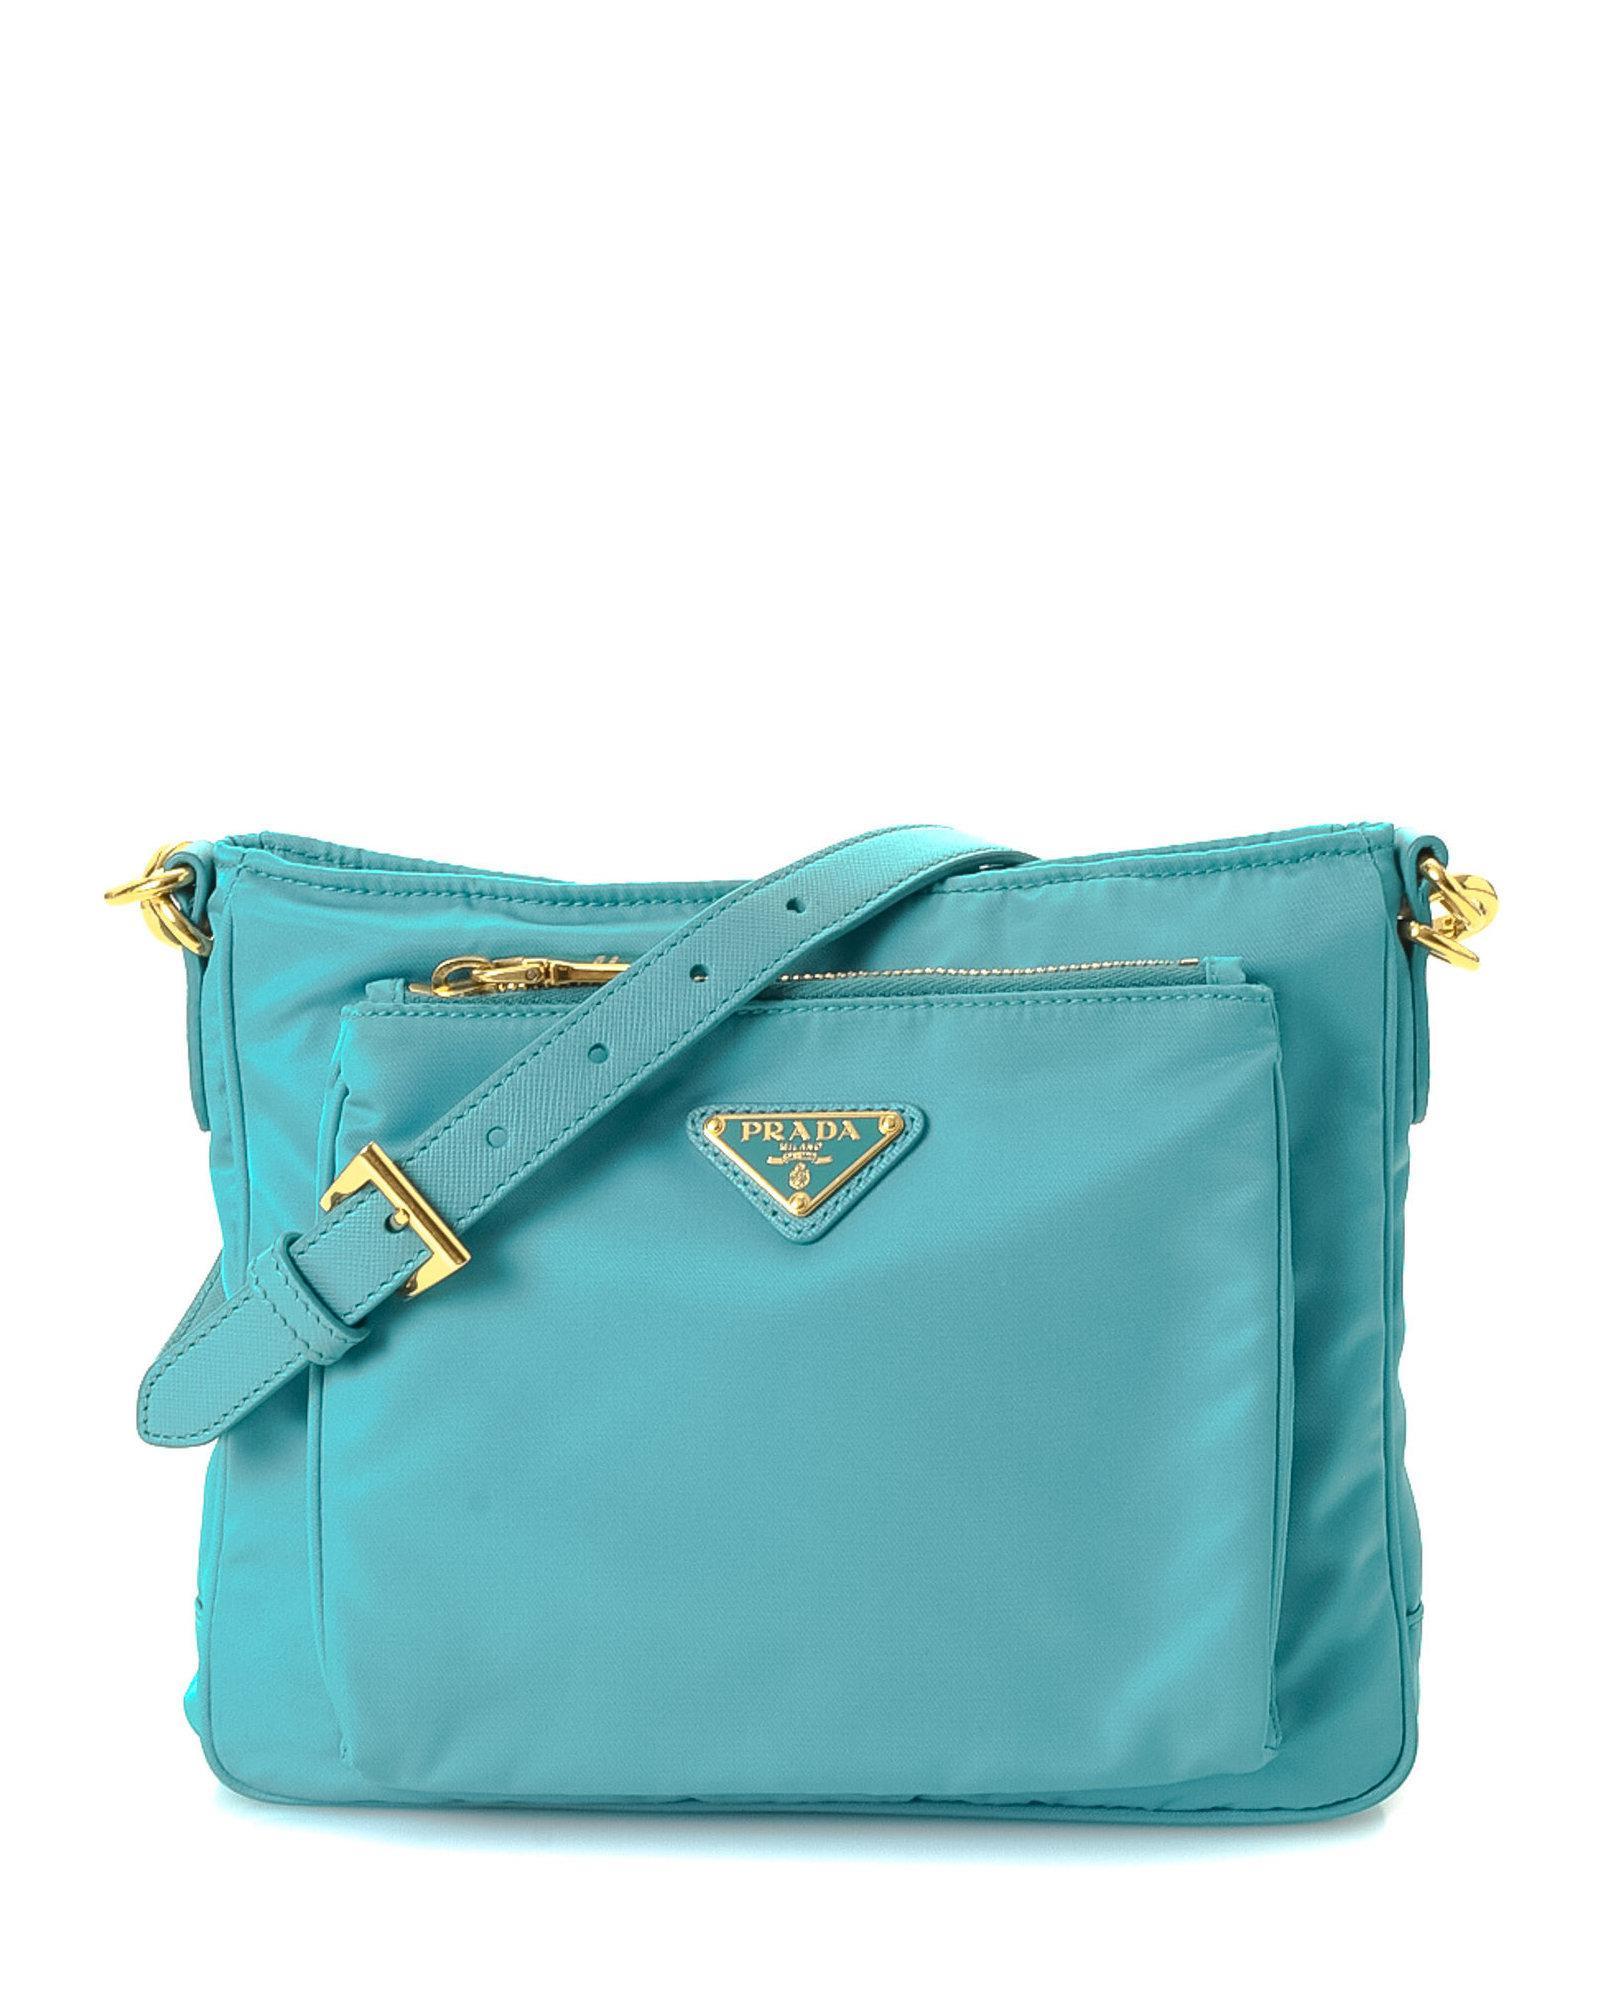 9811270dfd0882 ... get prada blue tessuto crossbody bag vintage lyst. view fullscreen  4514f 3463a